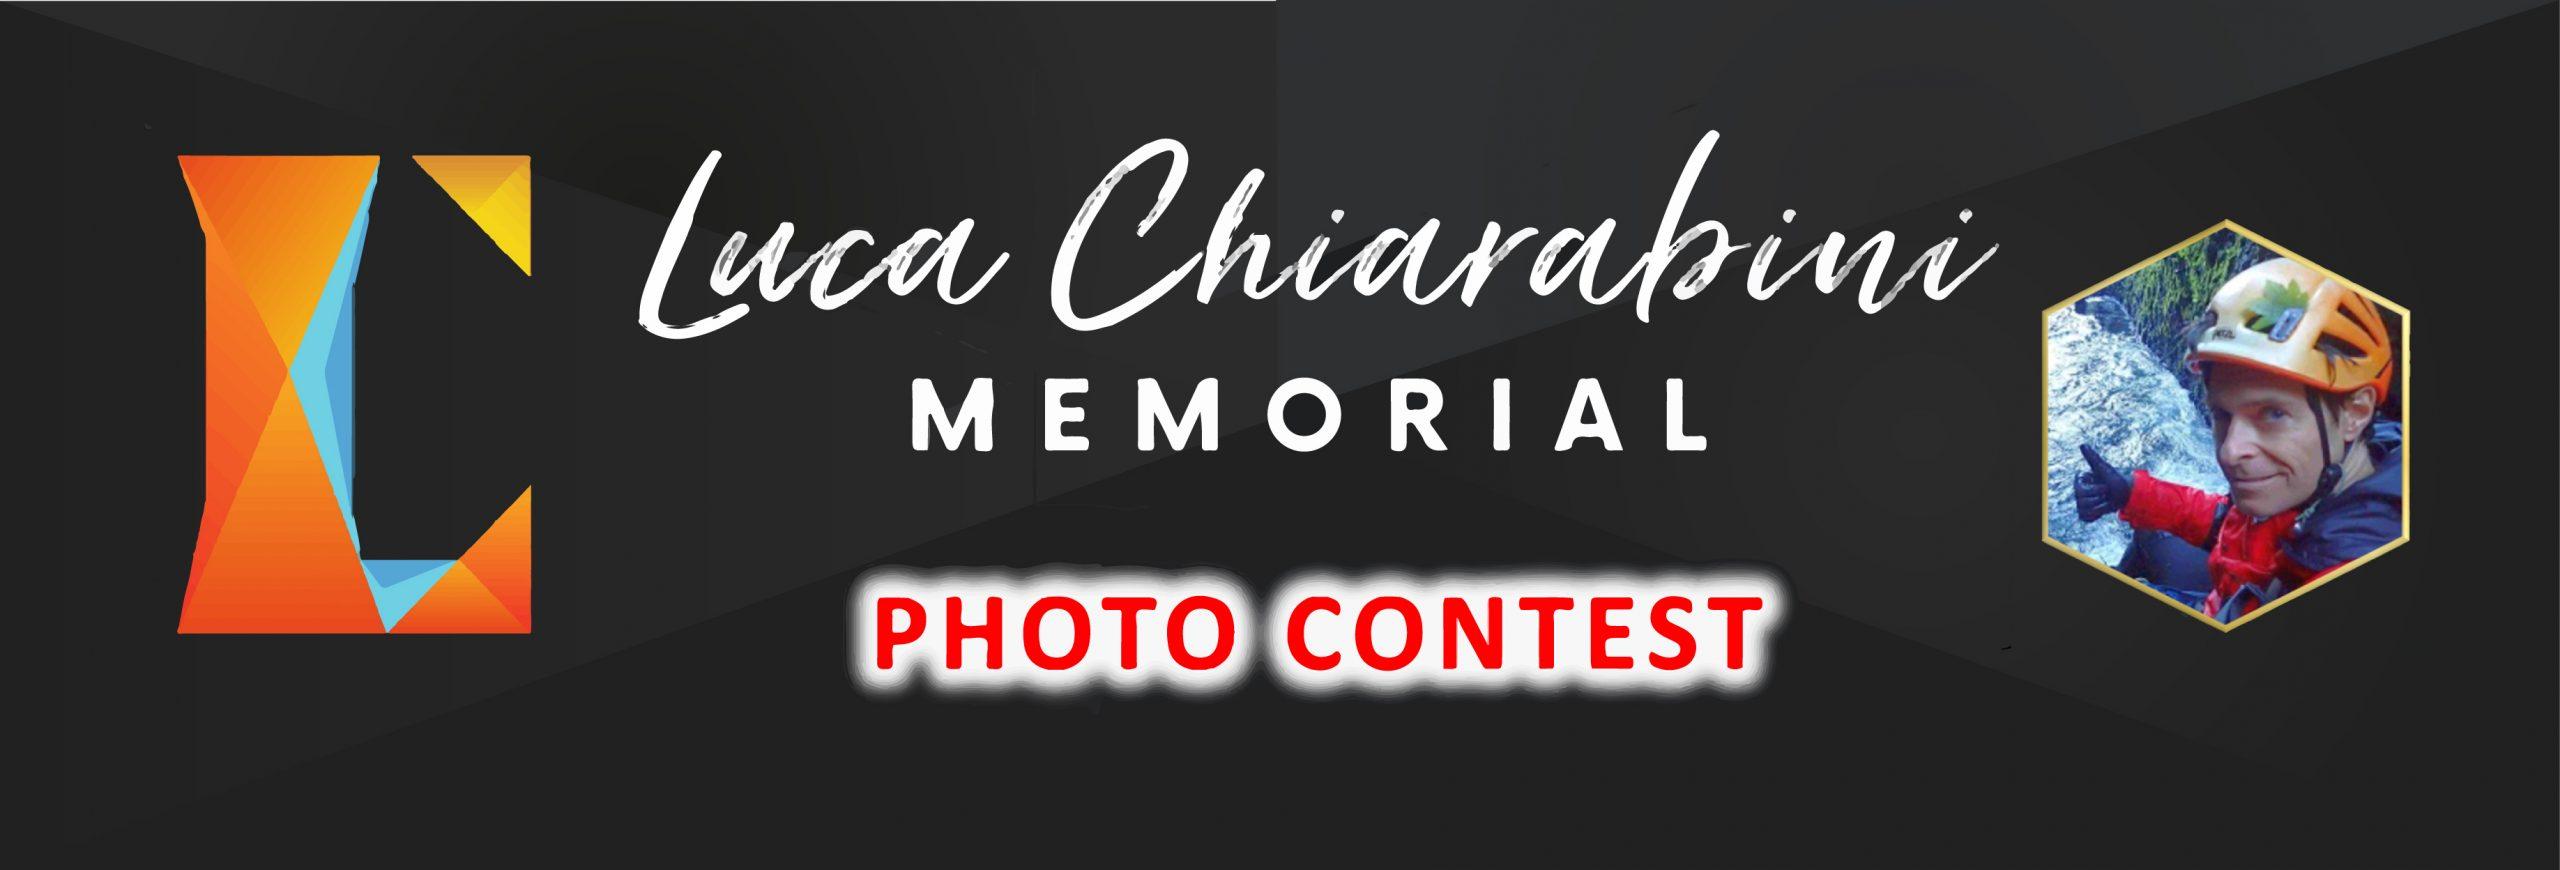 Concurs Fotogràfic Luca memorial